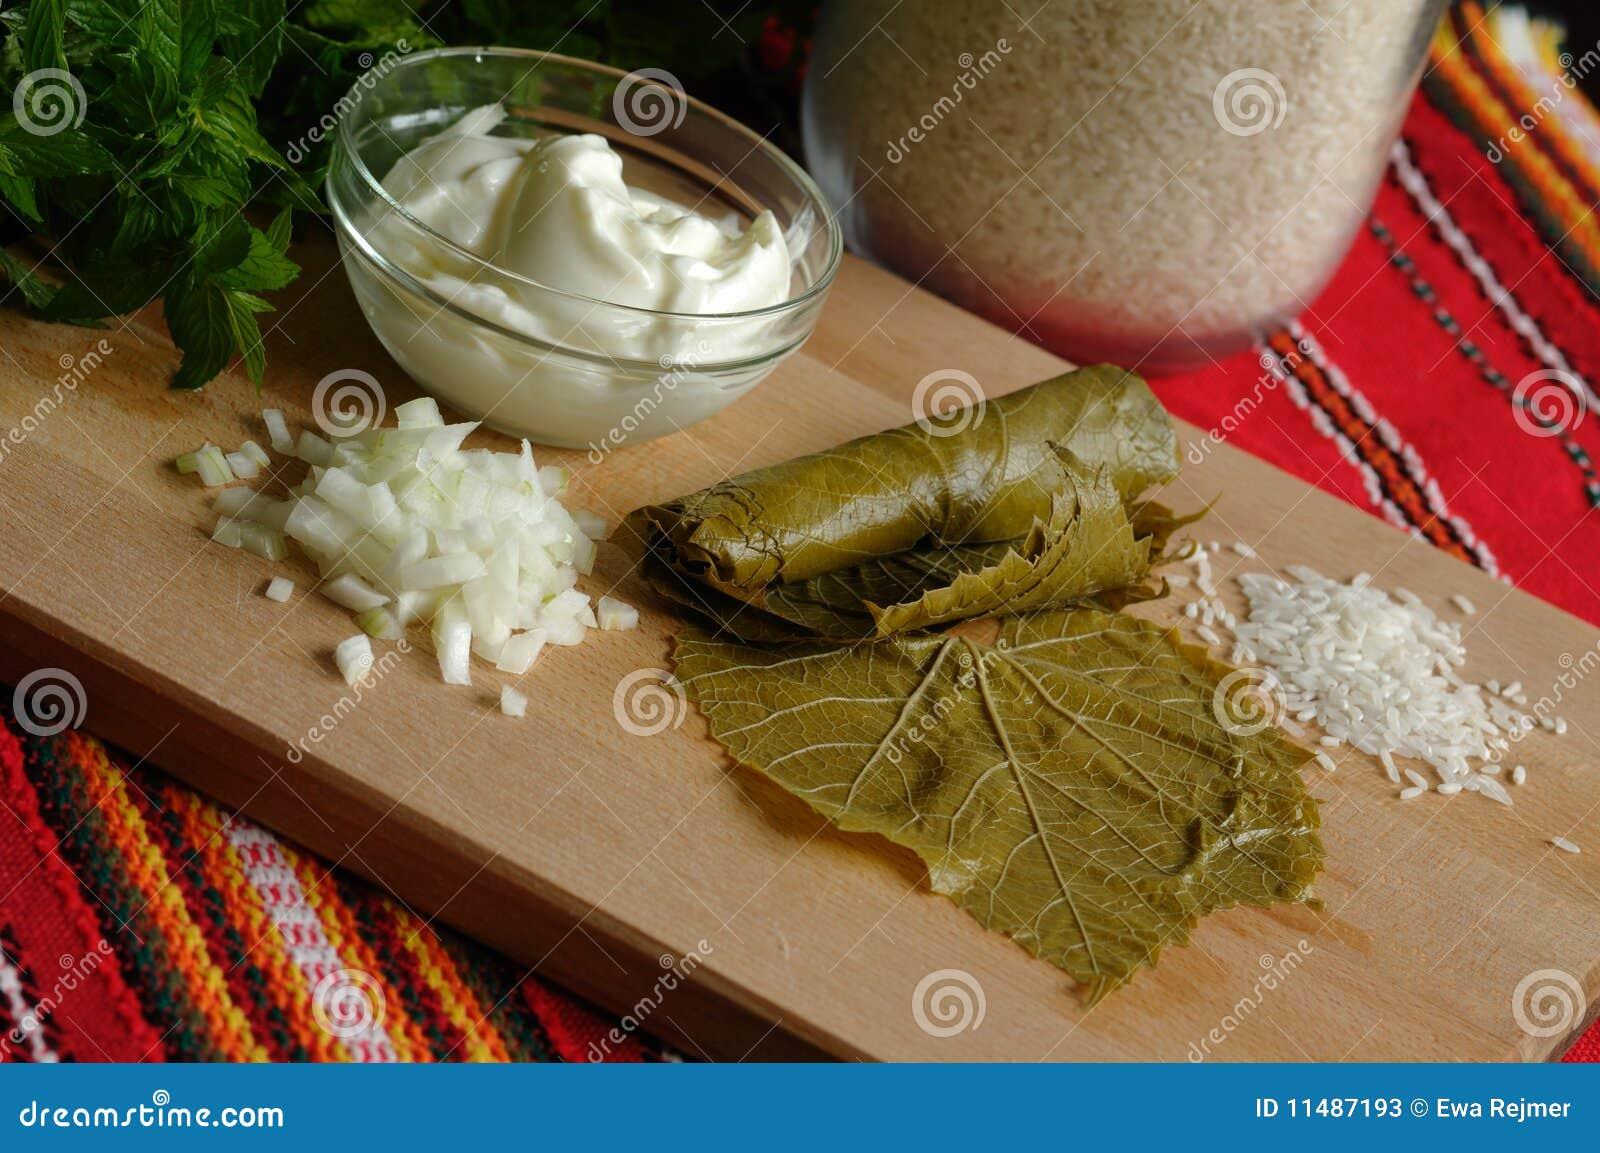 Products for sarma (dolmadakia)